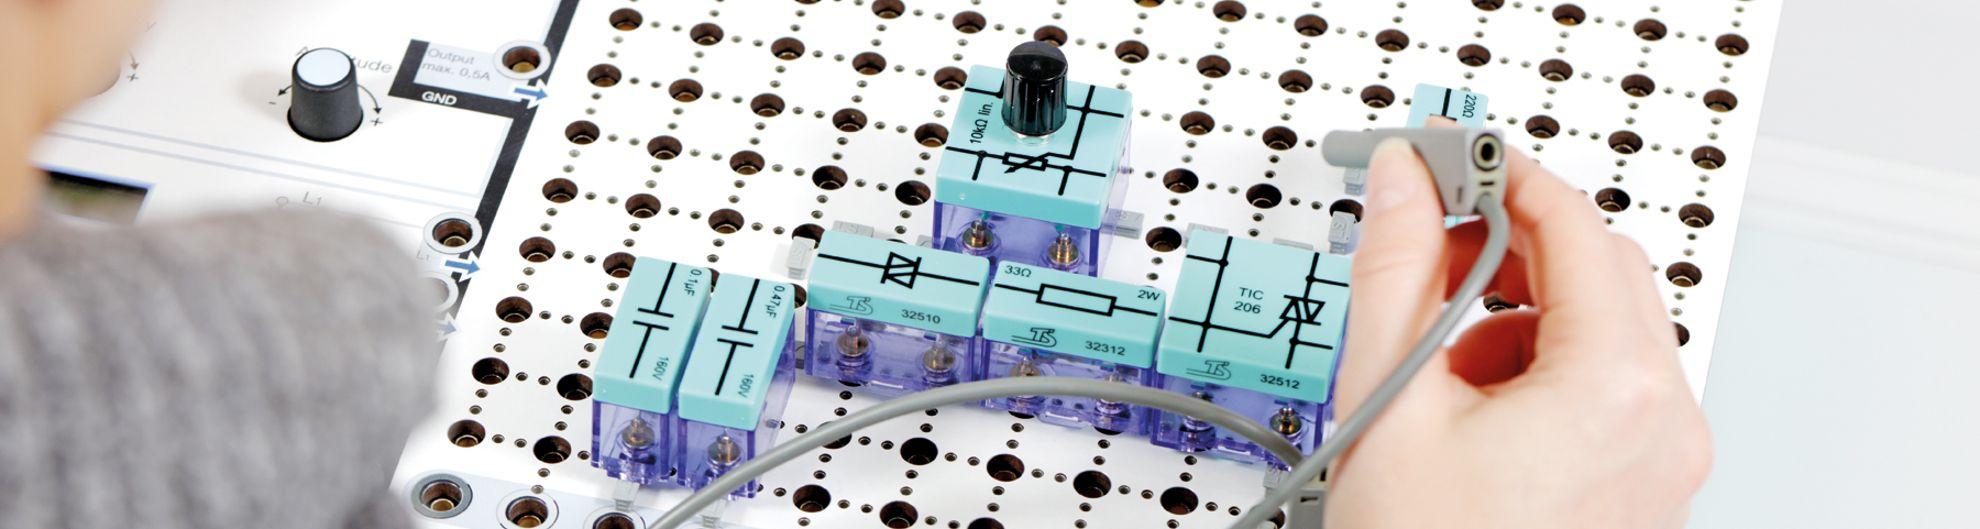 Electrical Engineering / Electronics